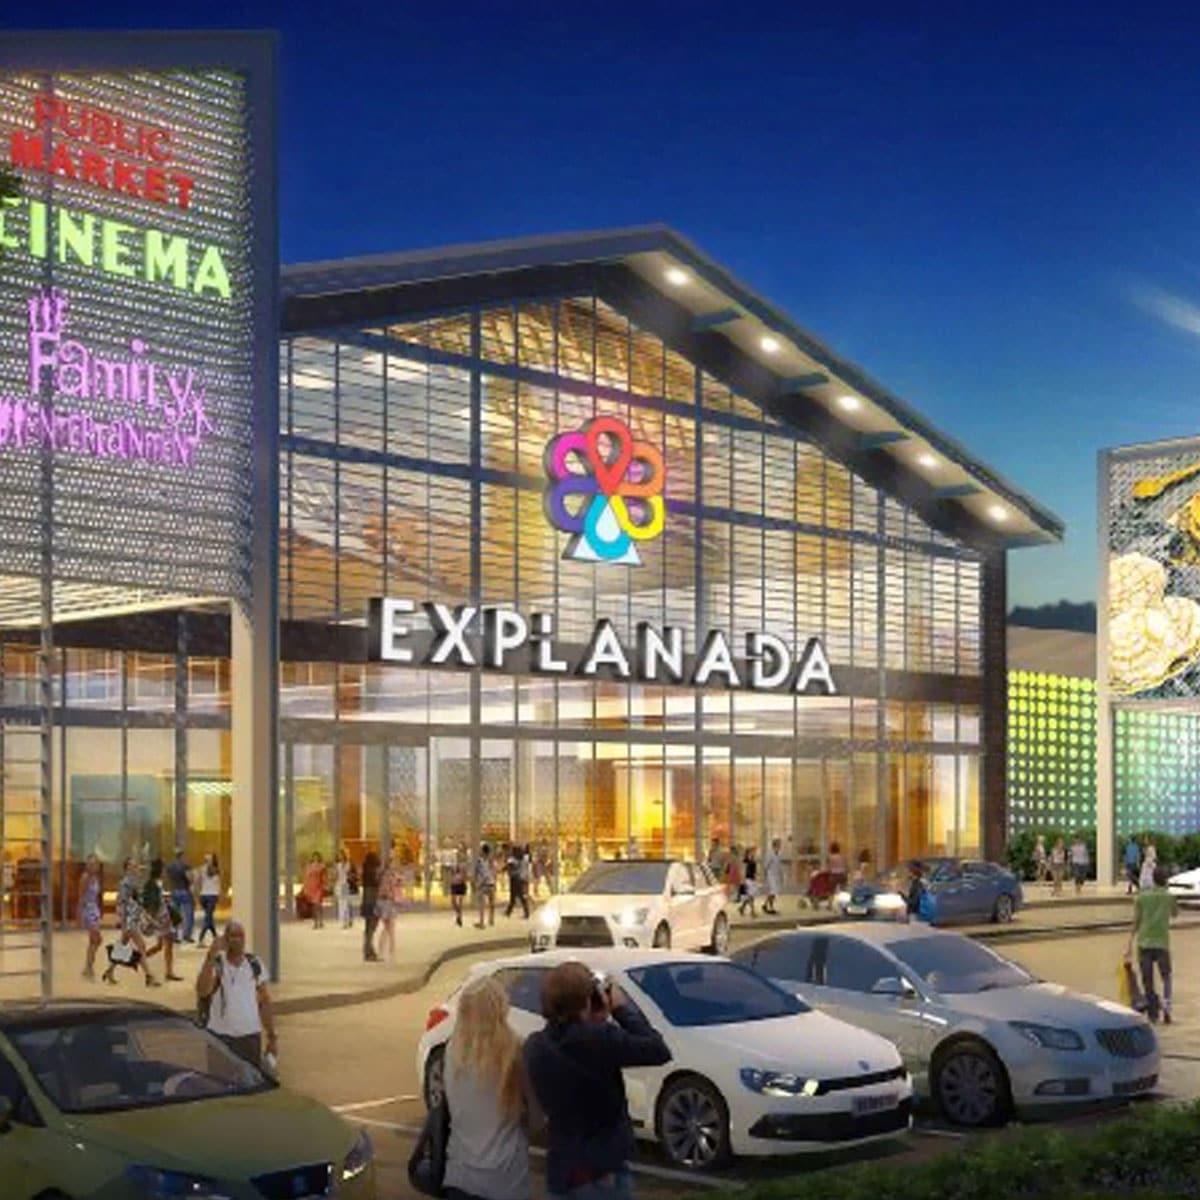 centro comercial explanada